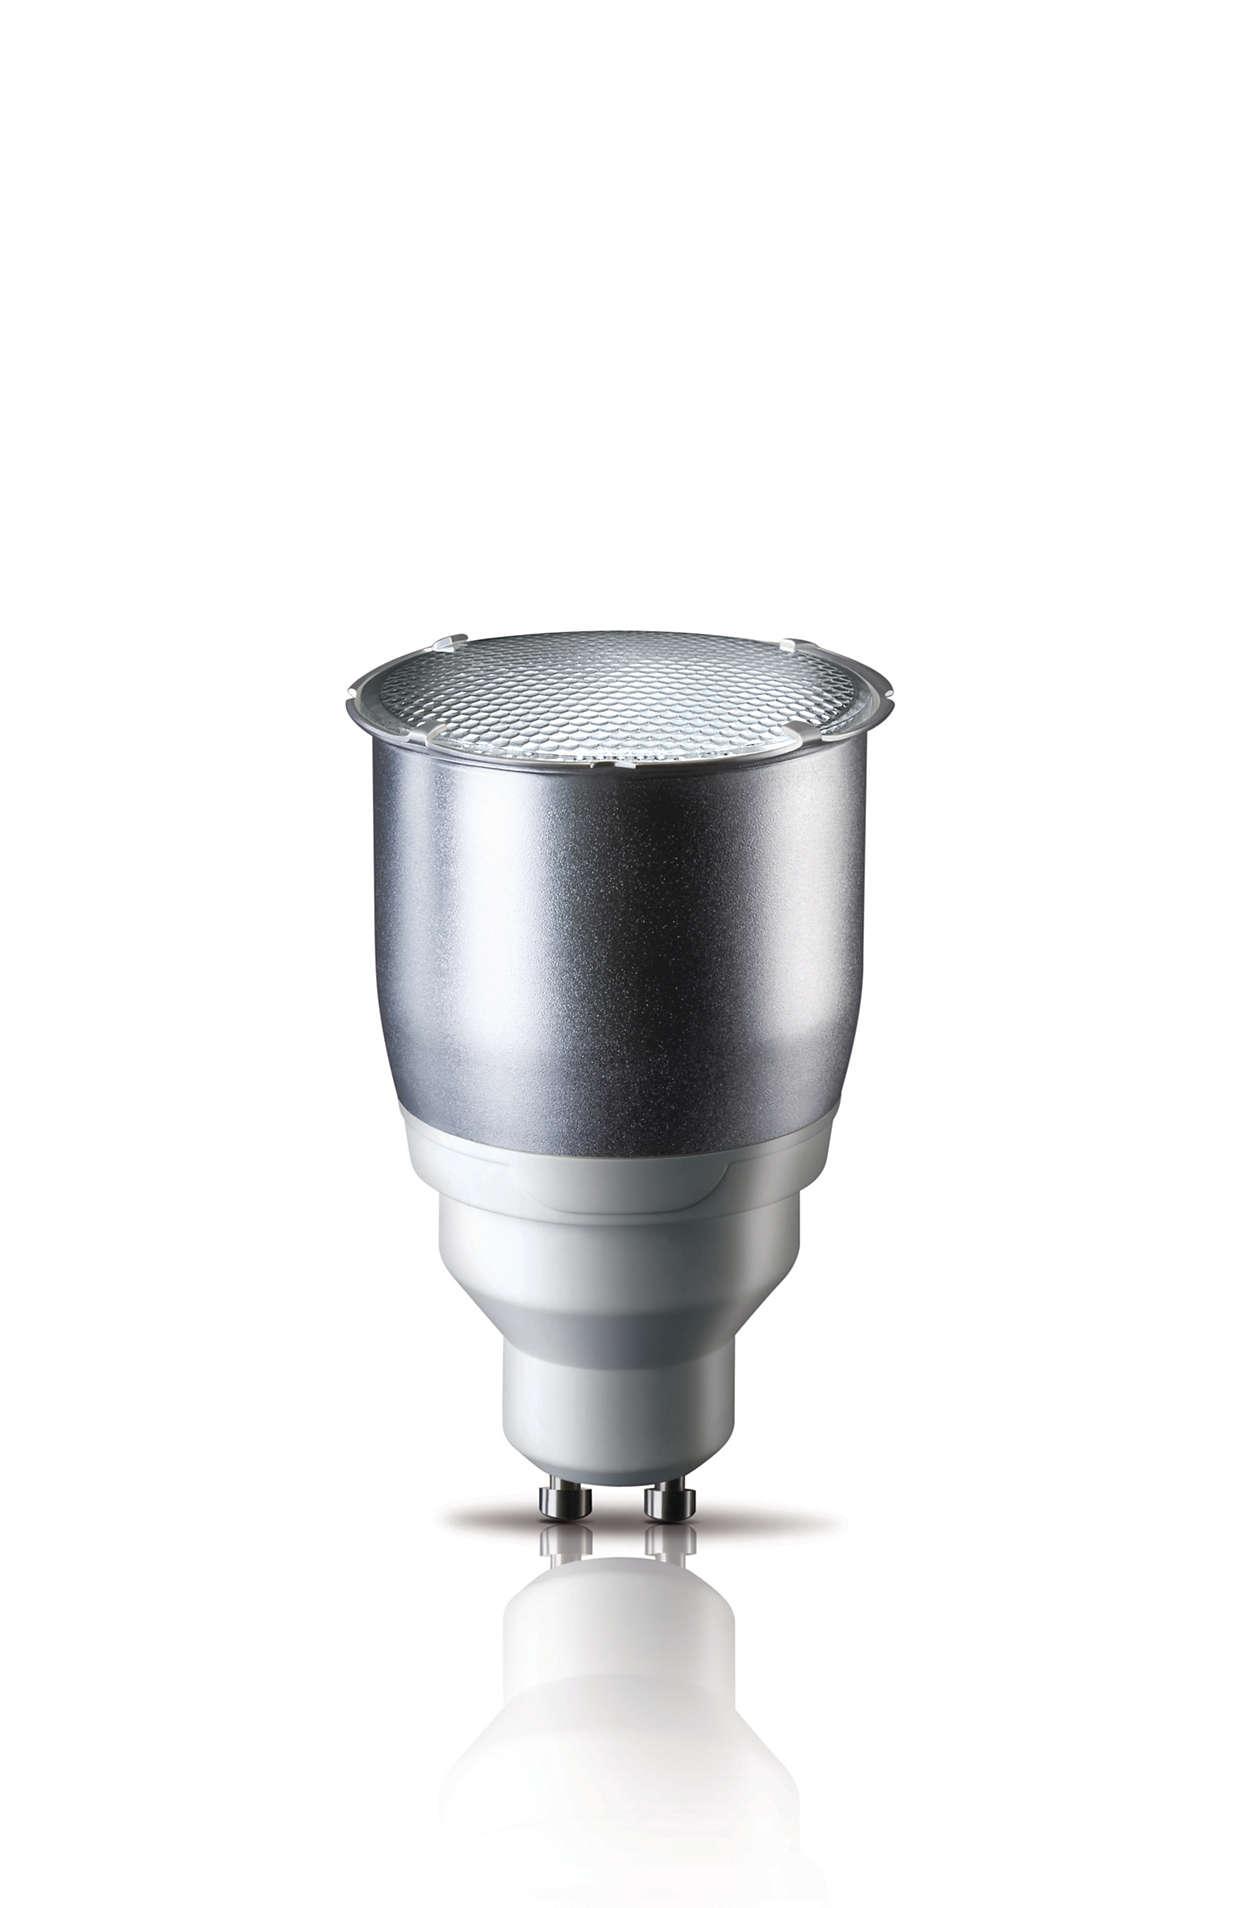 Energy saving bulb in a classic shape